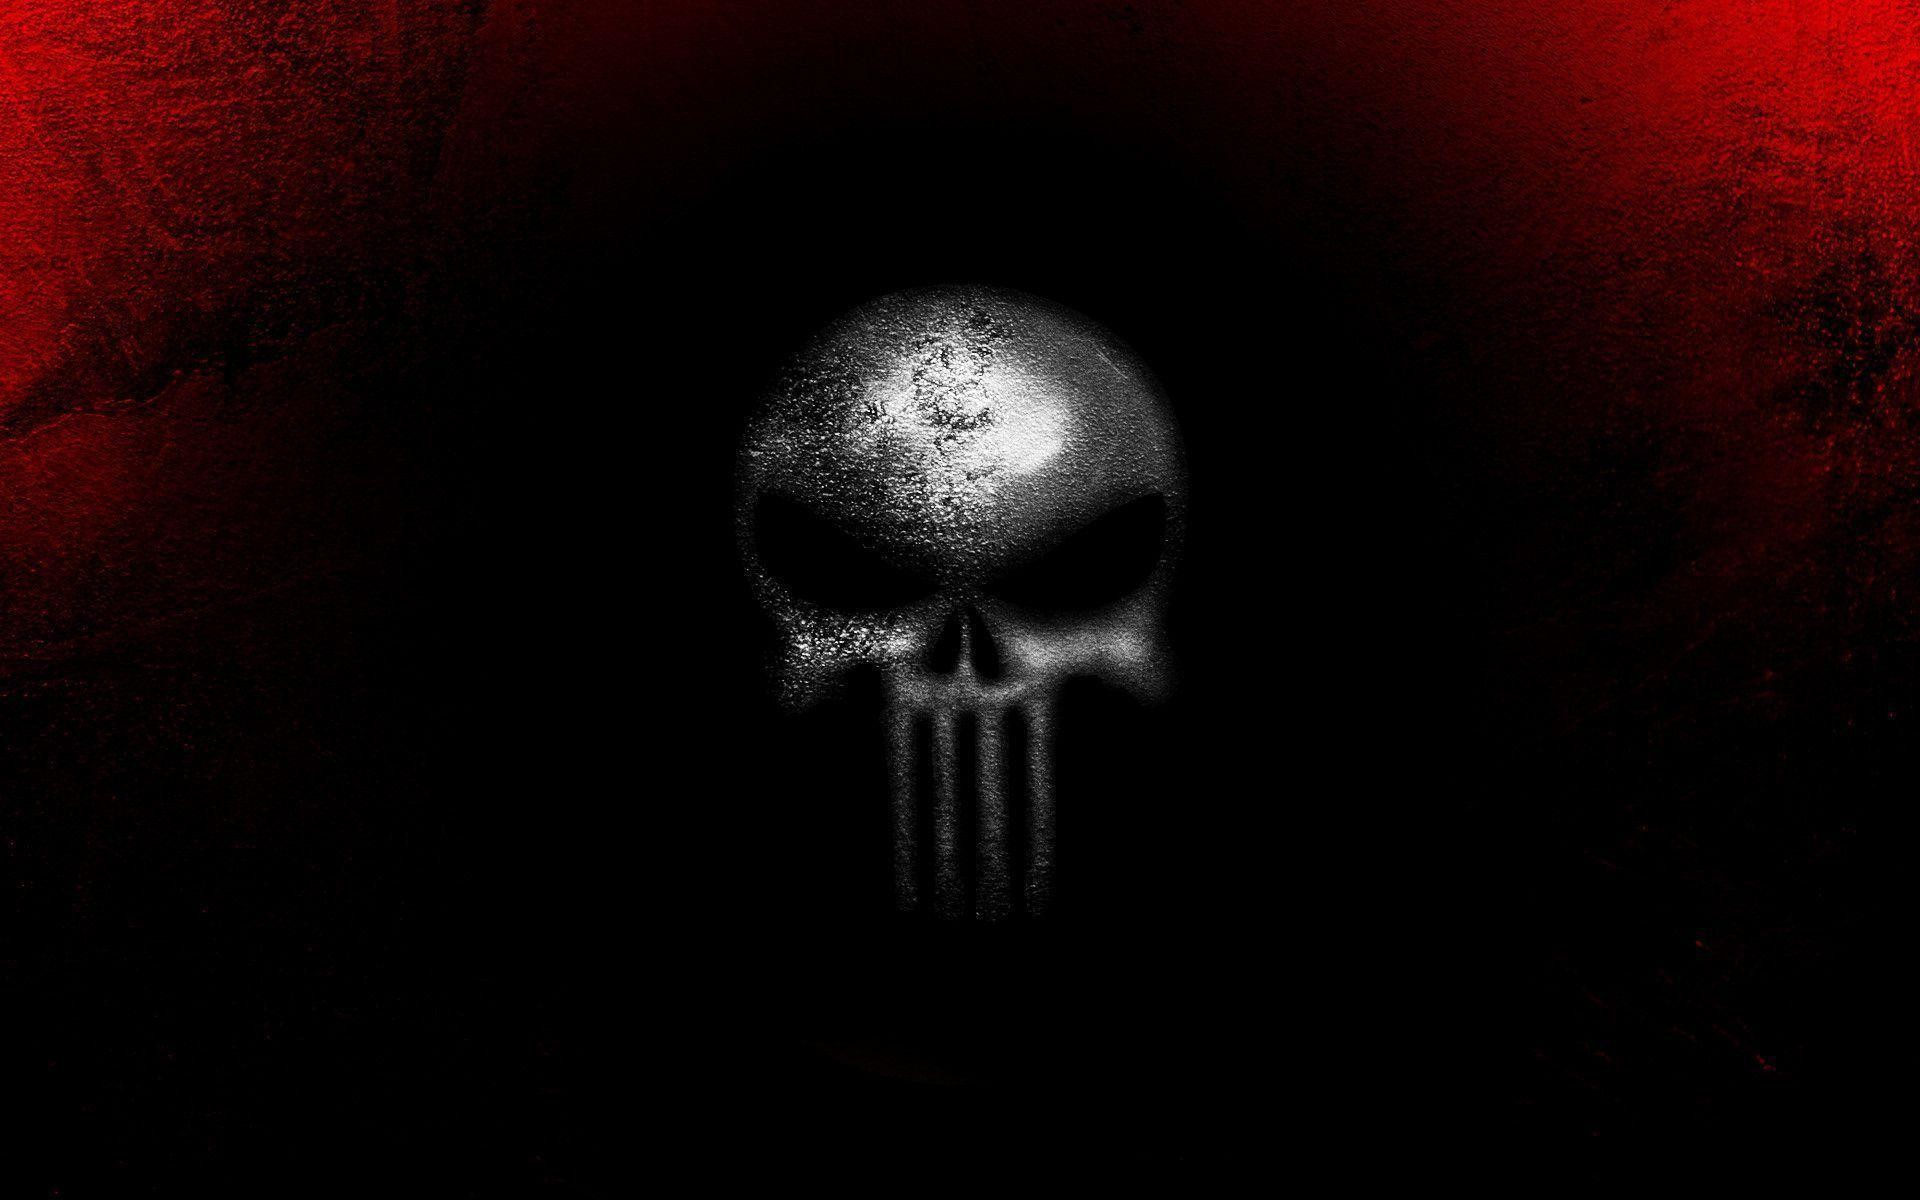 Punisher Skull HD Wallpaper | Download HD Wallpaper, High .